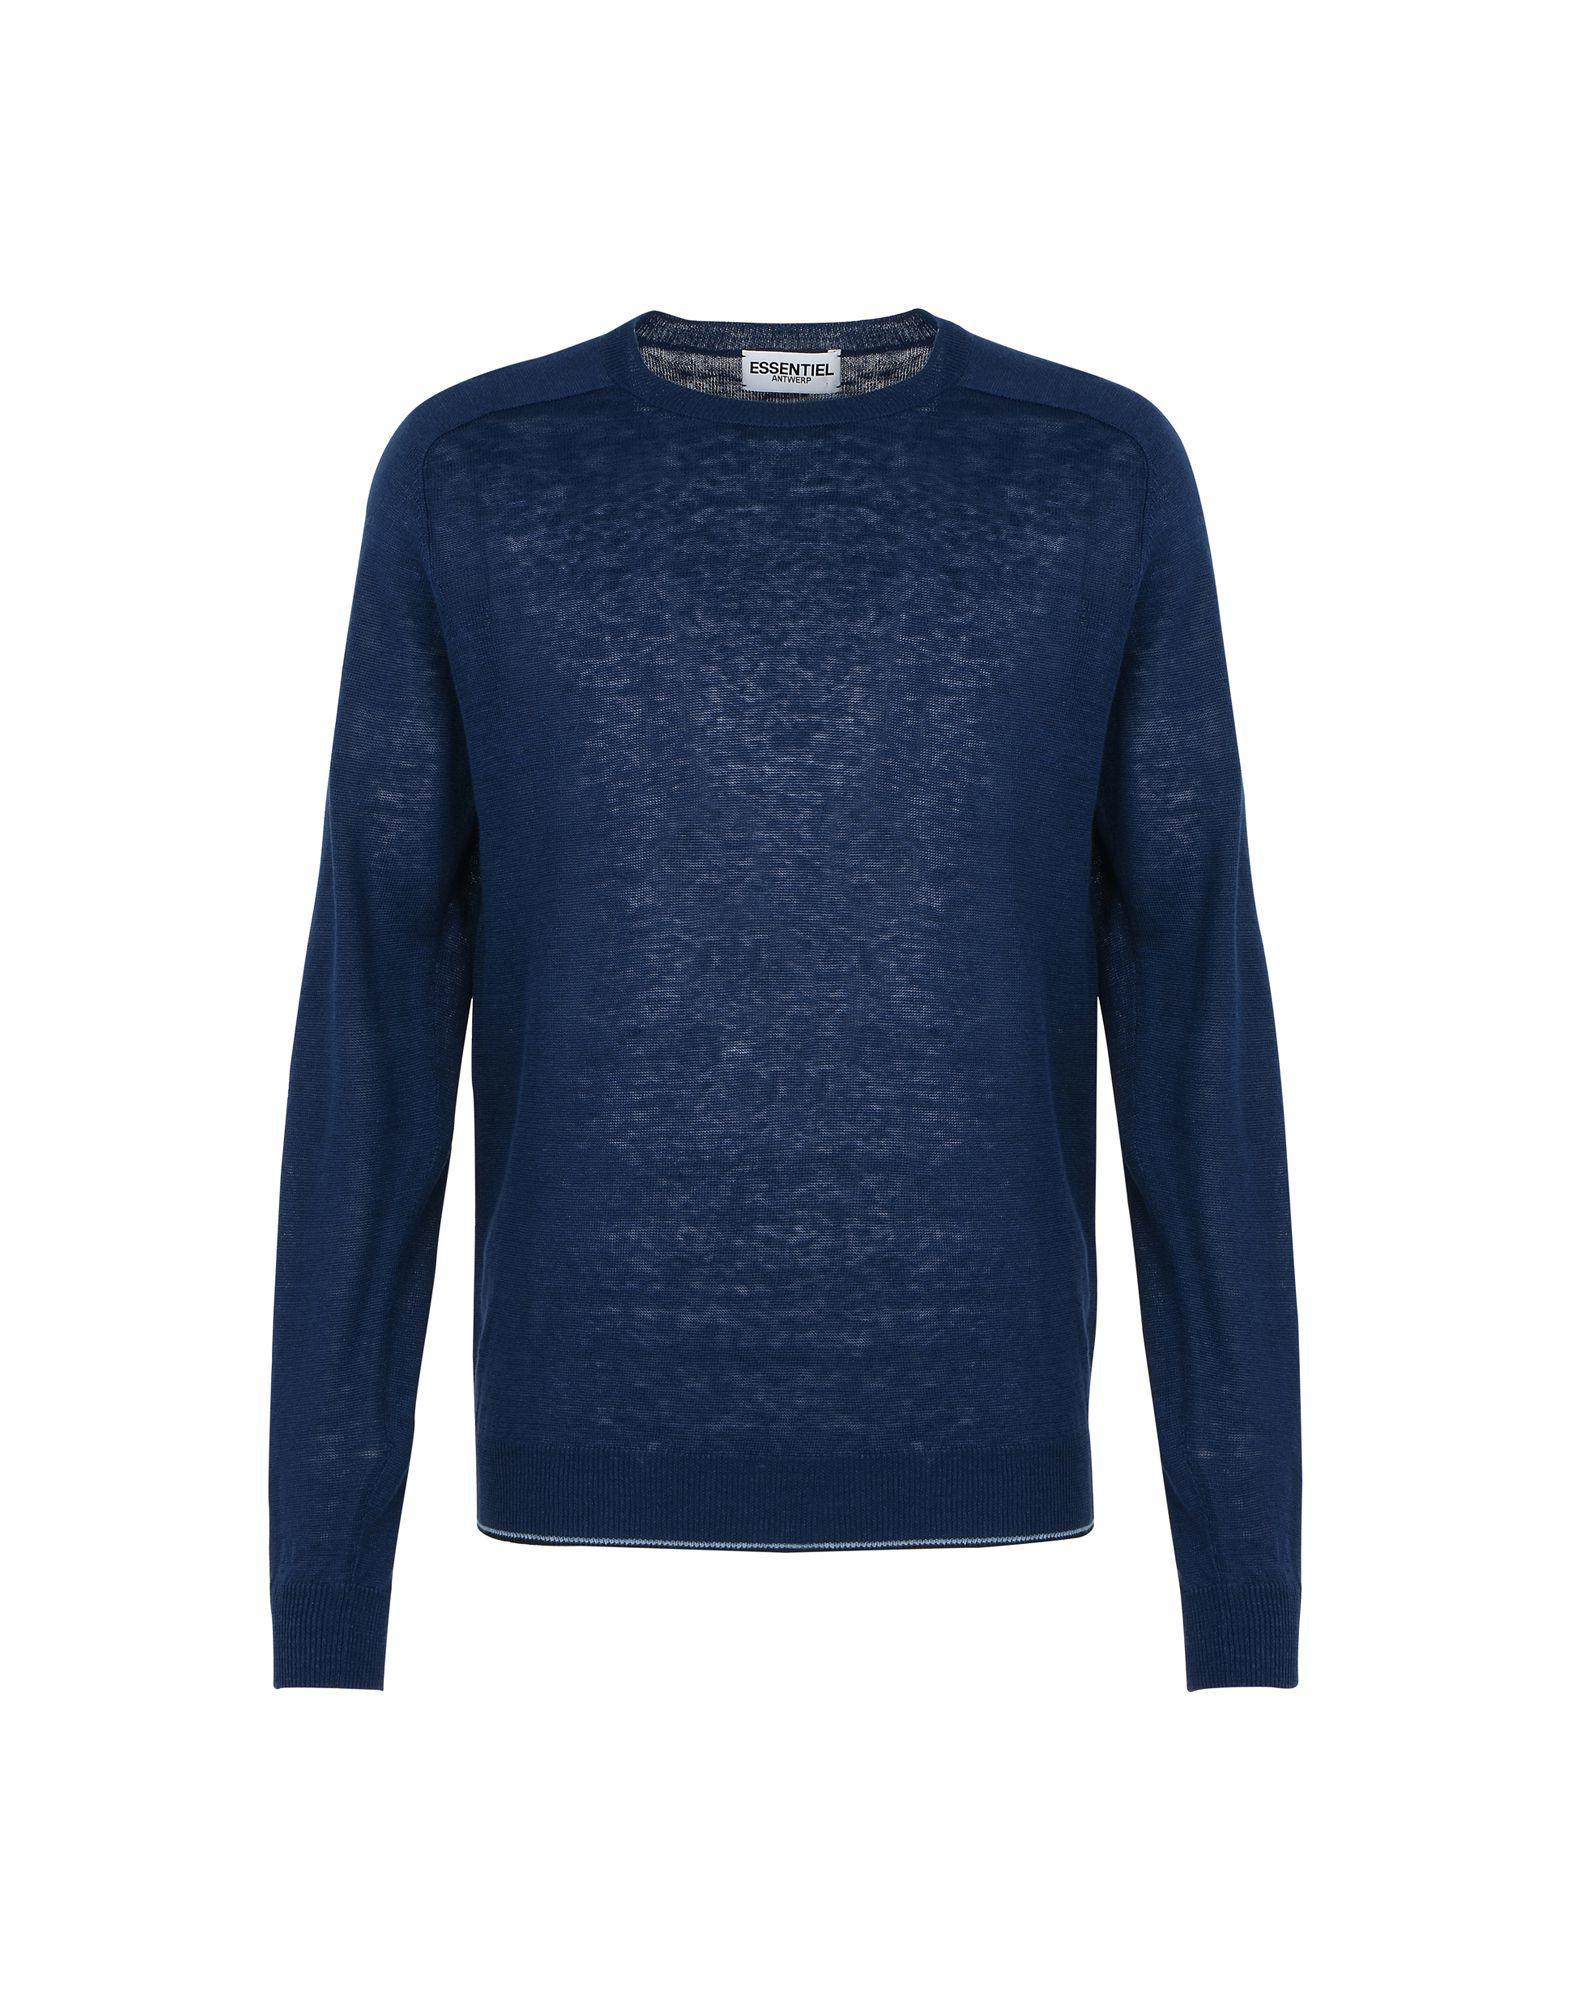 Essentiel Antwerp Sweater In Blue